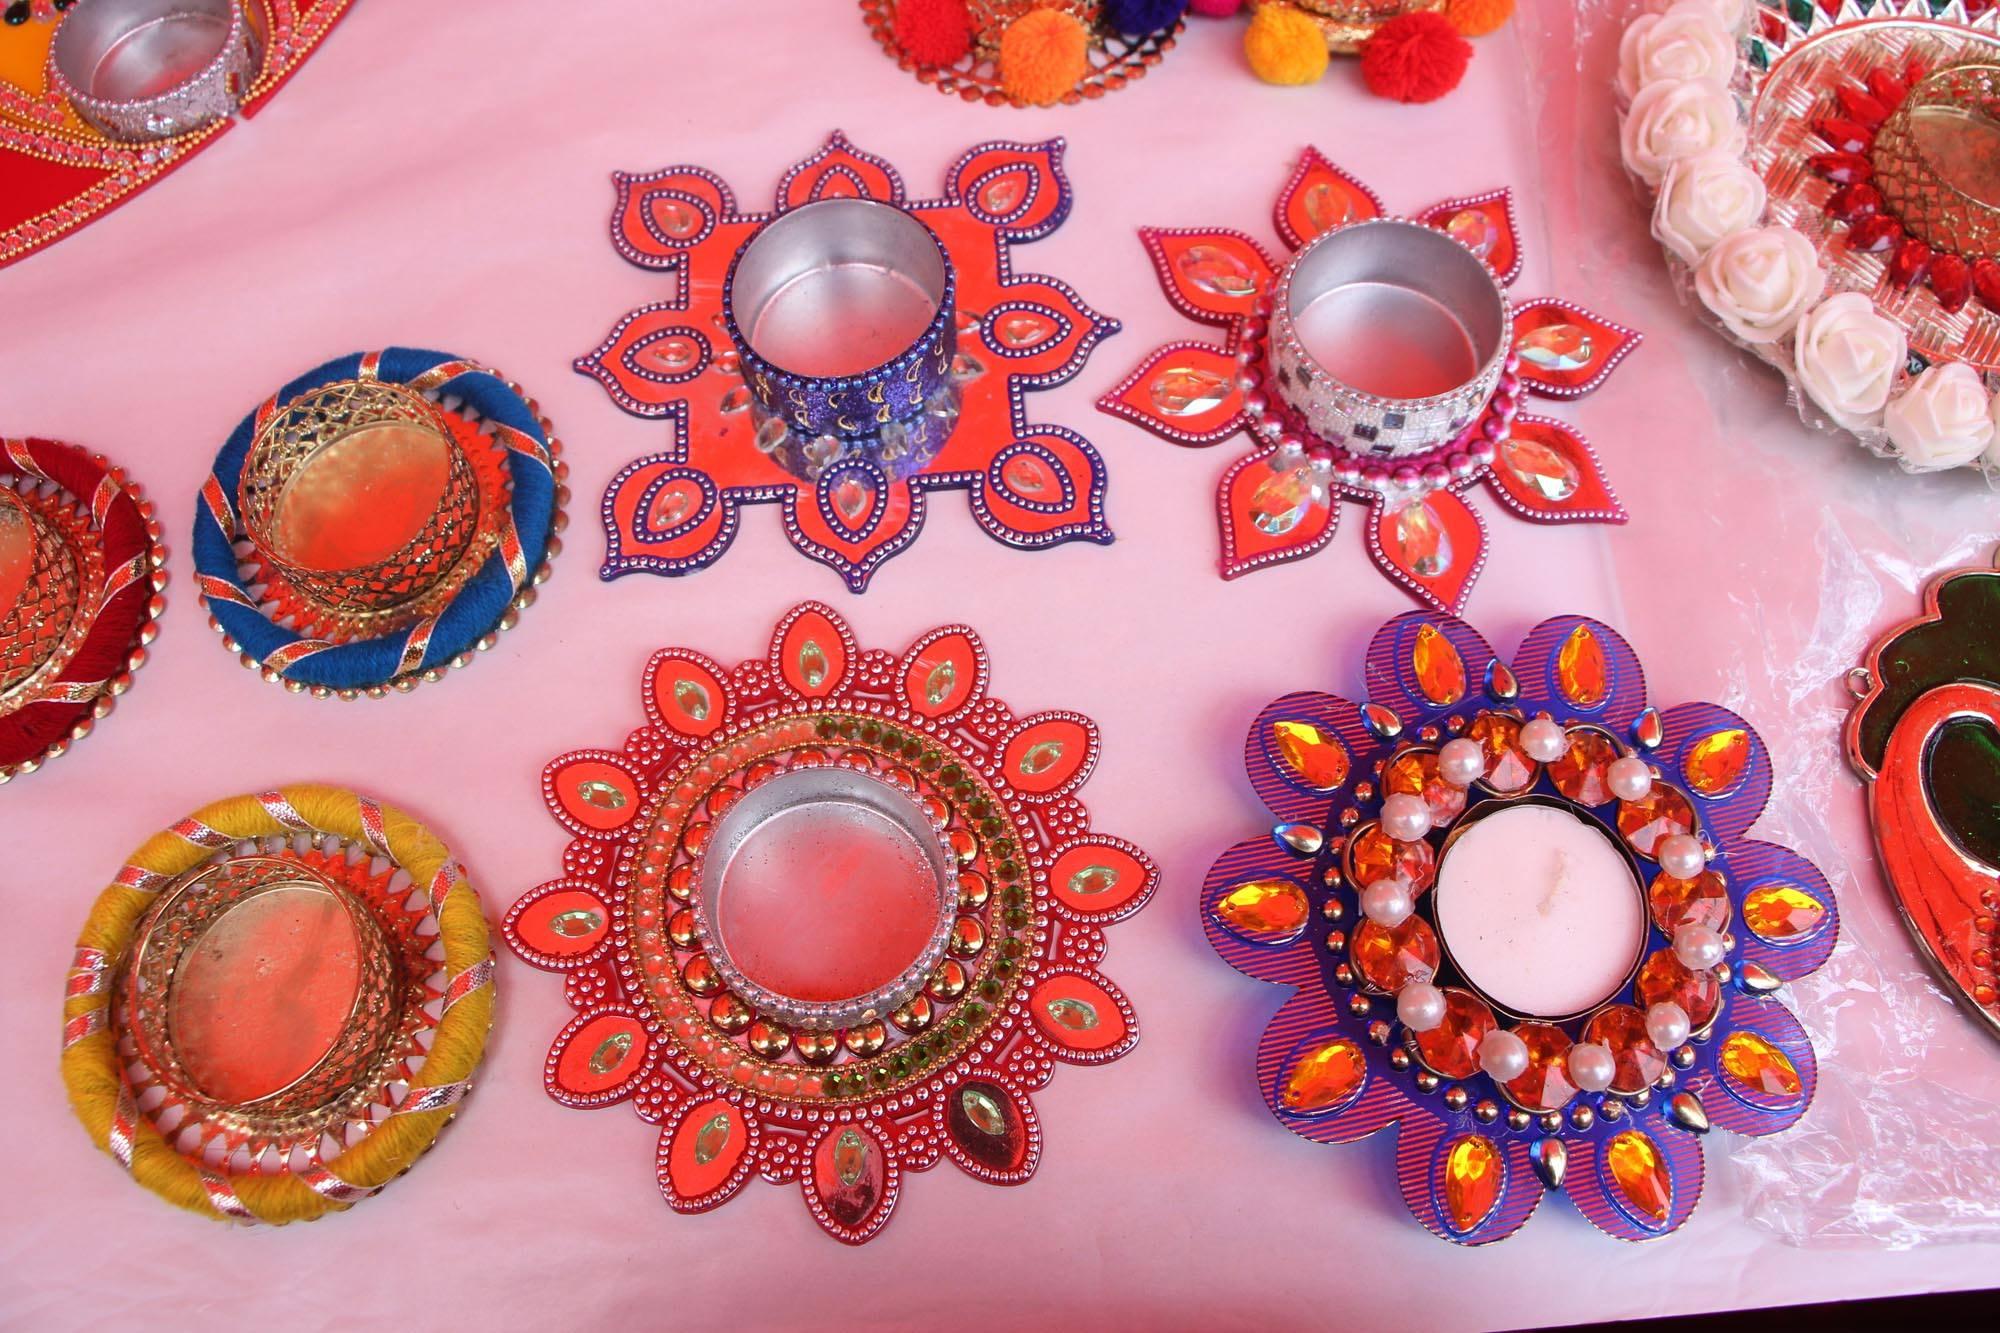 candor-diwali-Noida-62-7.jpg